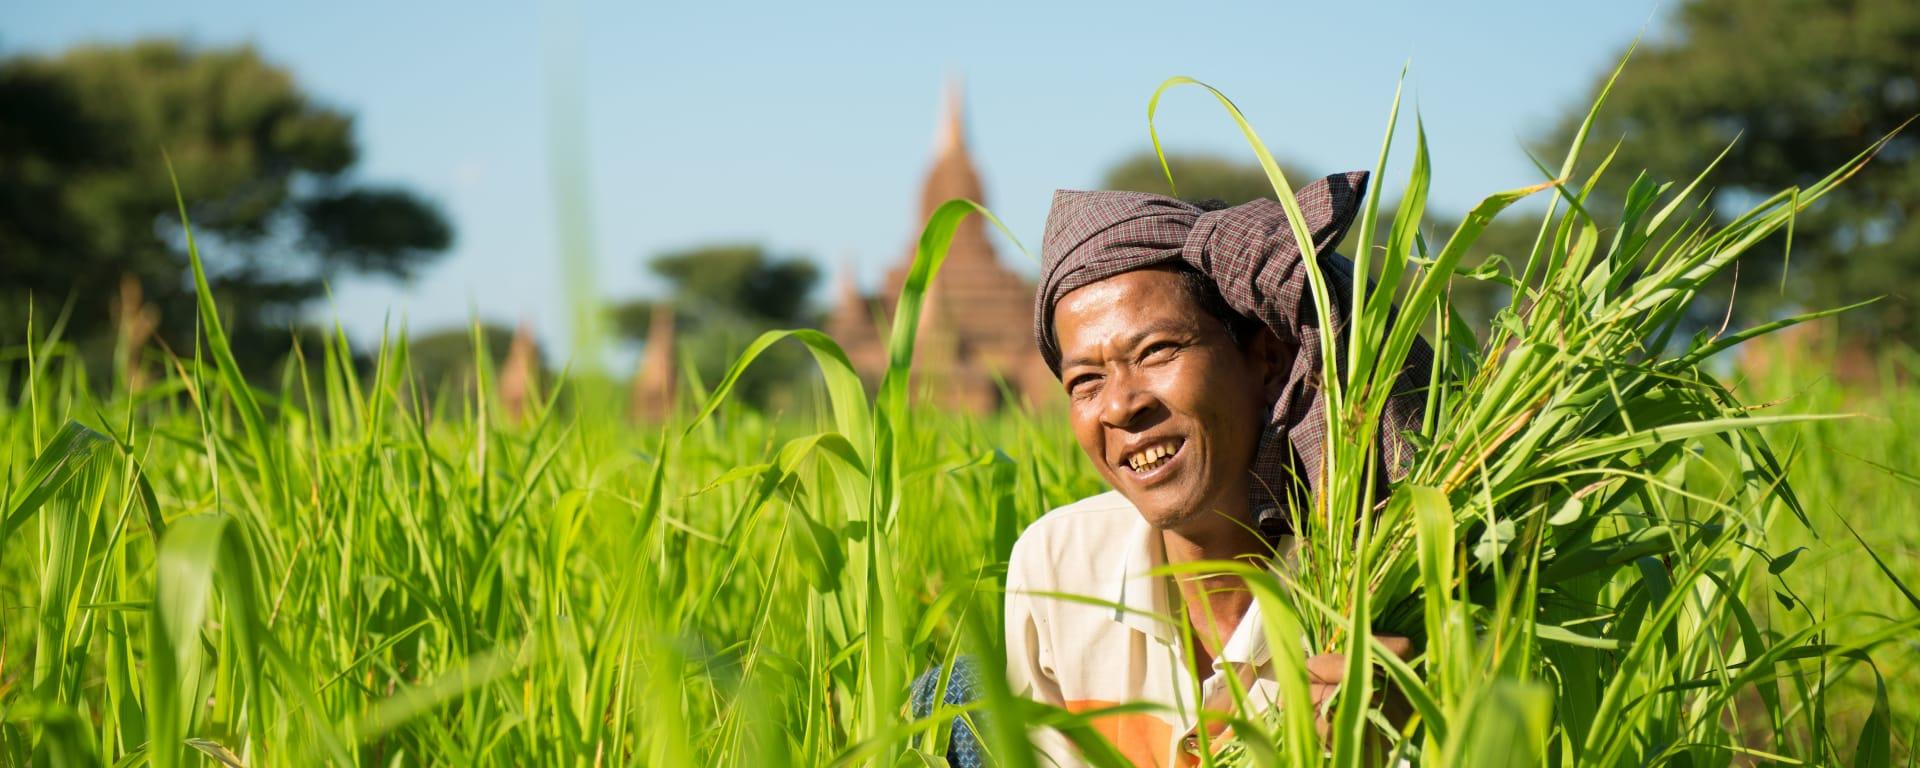 Myanmar entdecken mit Tischler Reisen: Myanmar Landleben Baeuerin